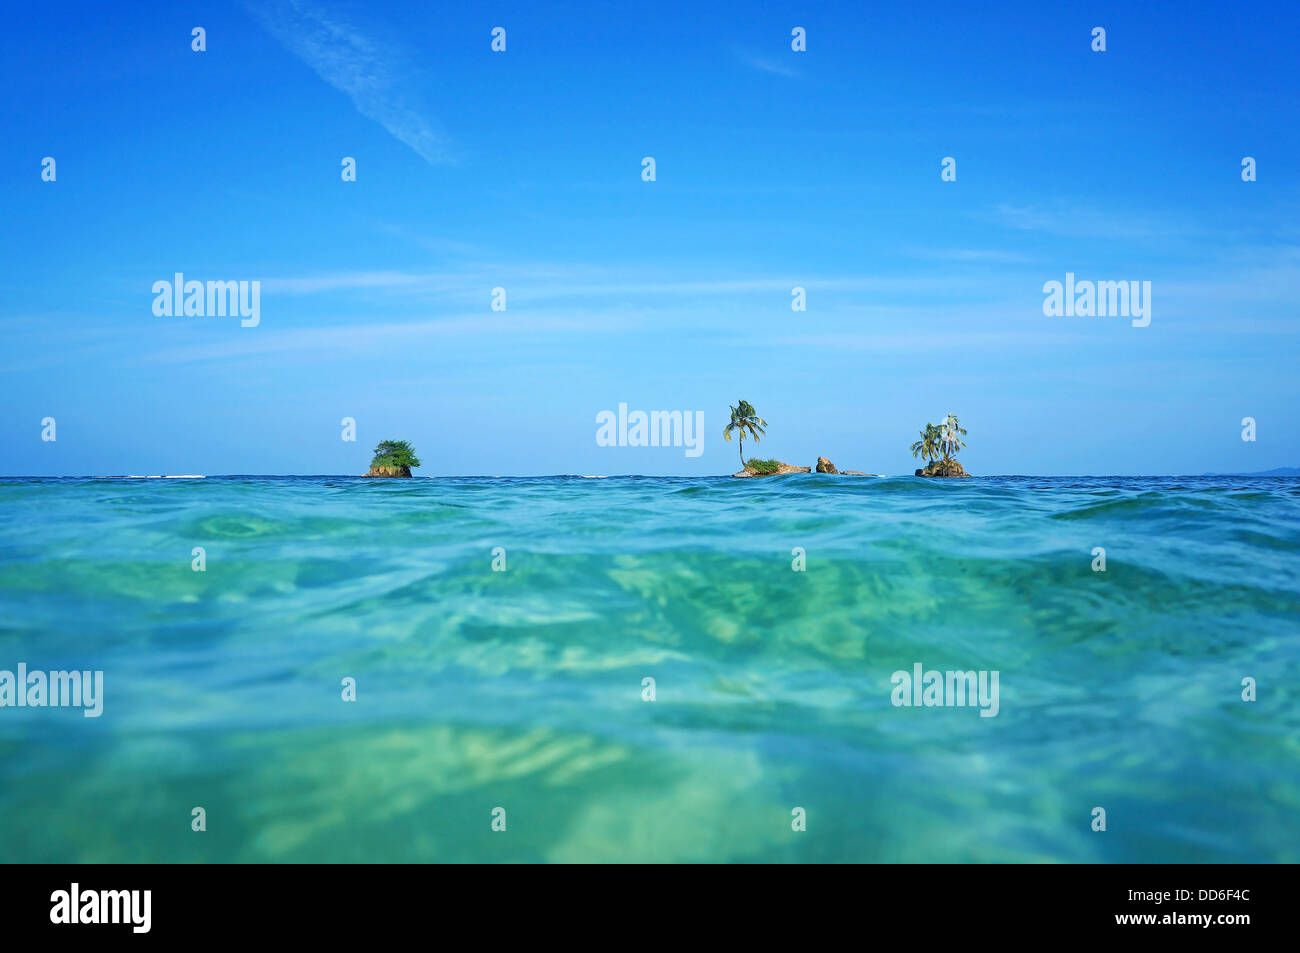 Horizon over water with small islets and coconut tree, Caribbean sea, Zapatillas Keys, Bocas del Toro, Panama - Stock Image